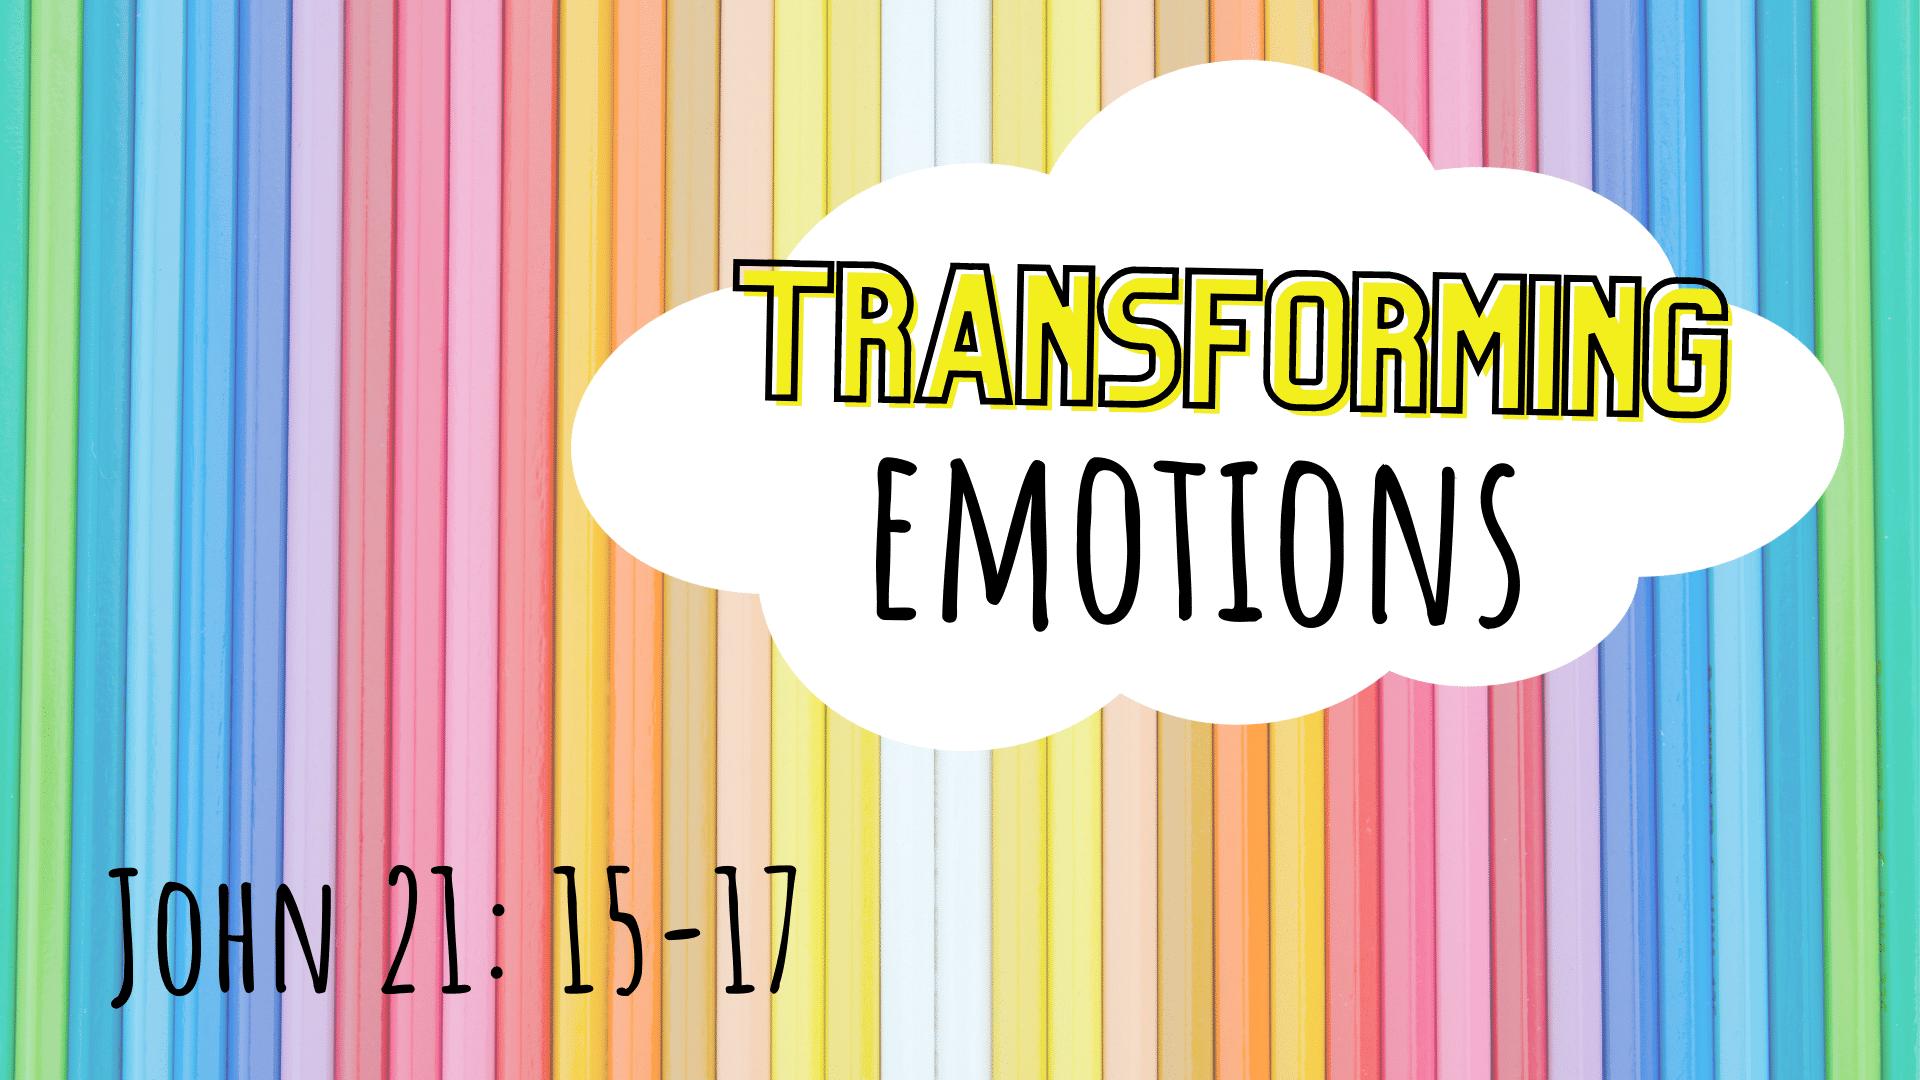 Transforming Emotions